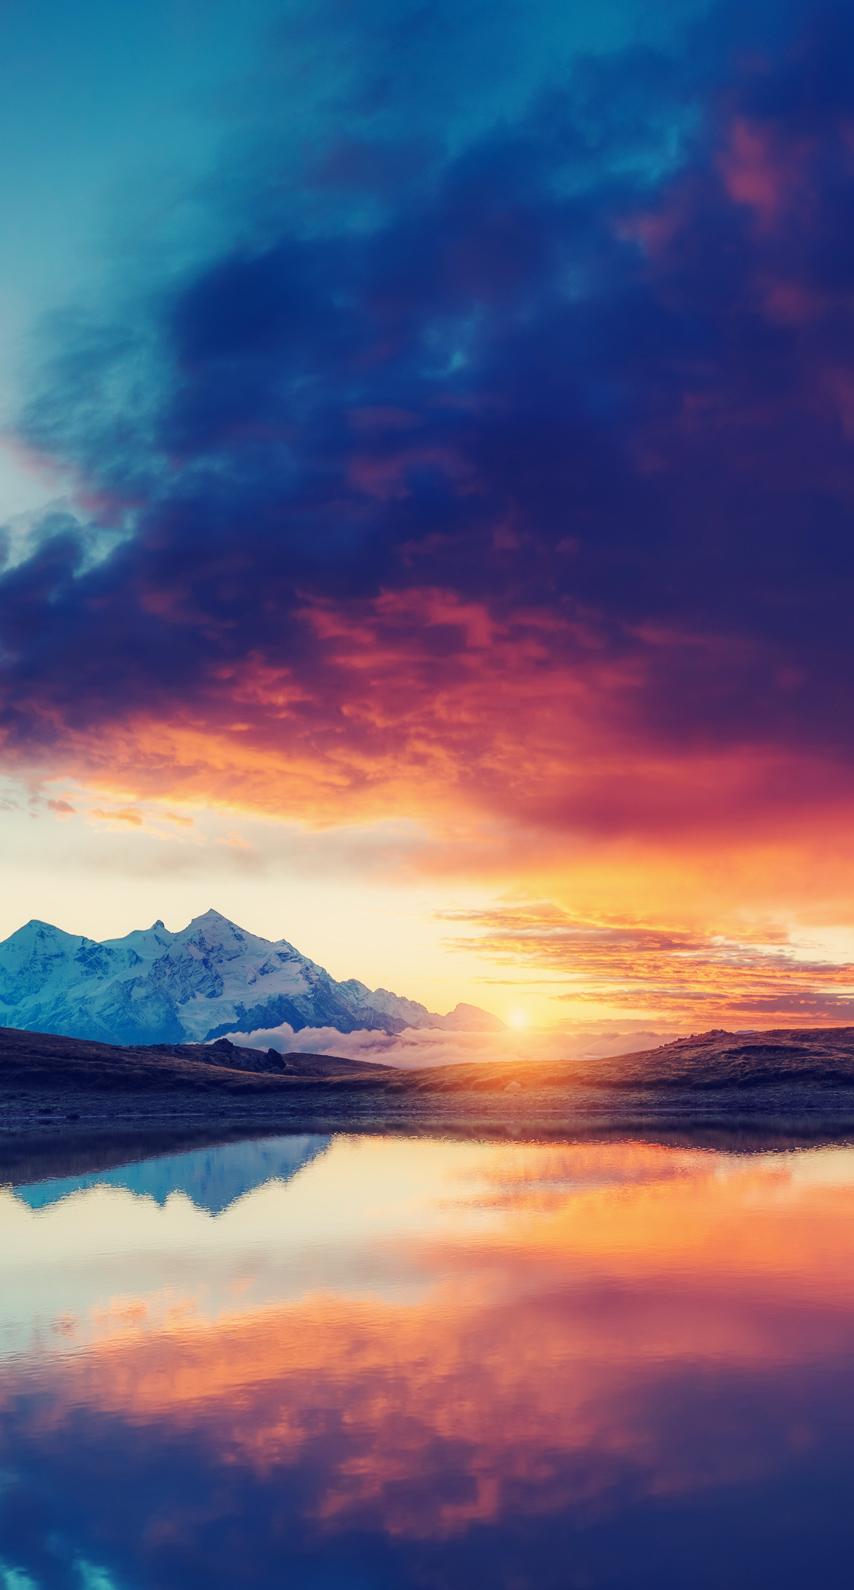 dawn, fair weather, dusk, outdoors, reflection, idyllic, composure